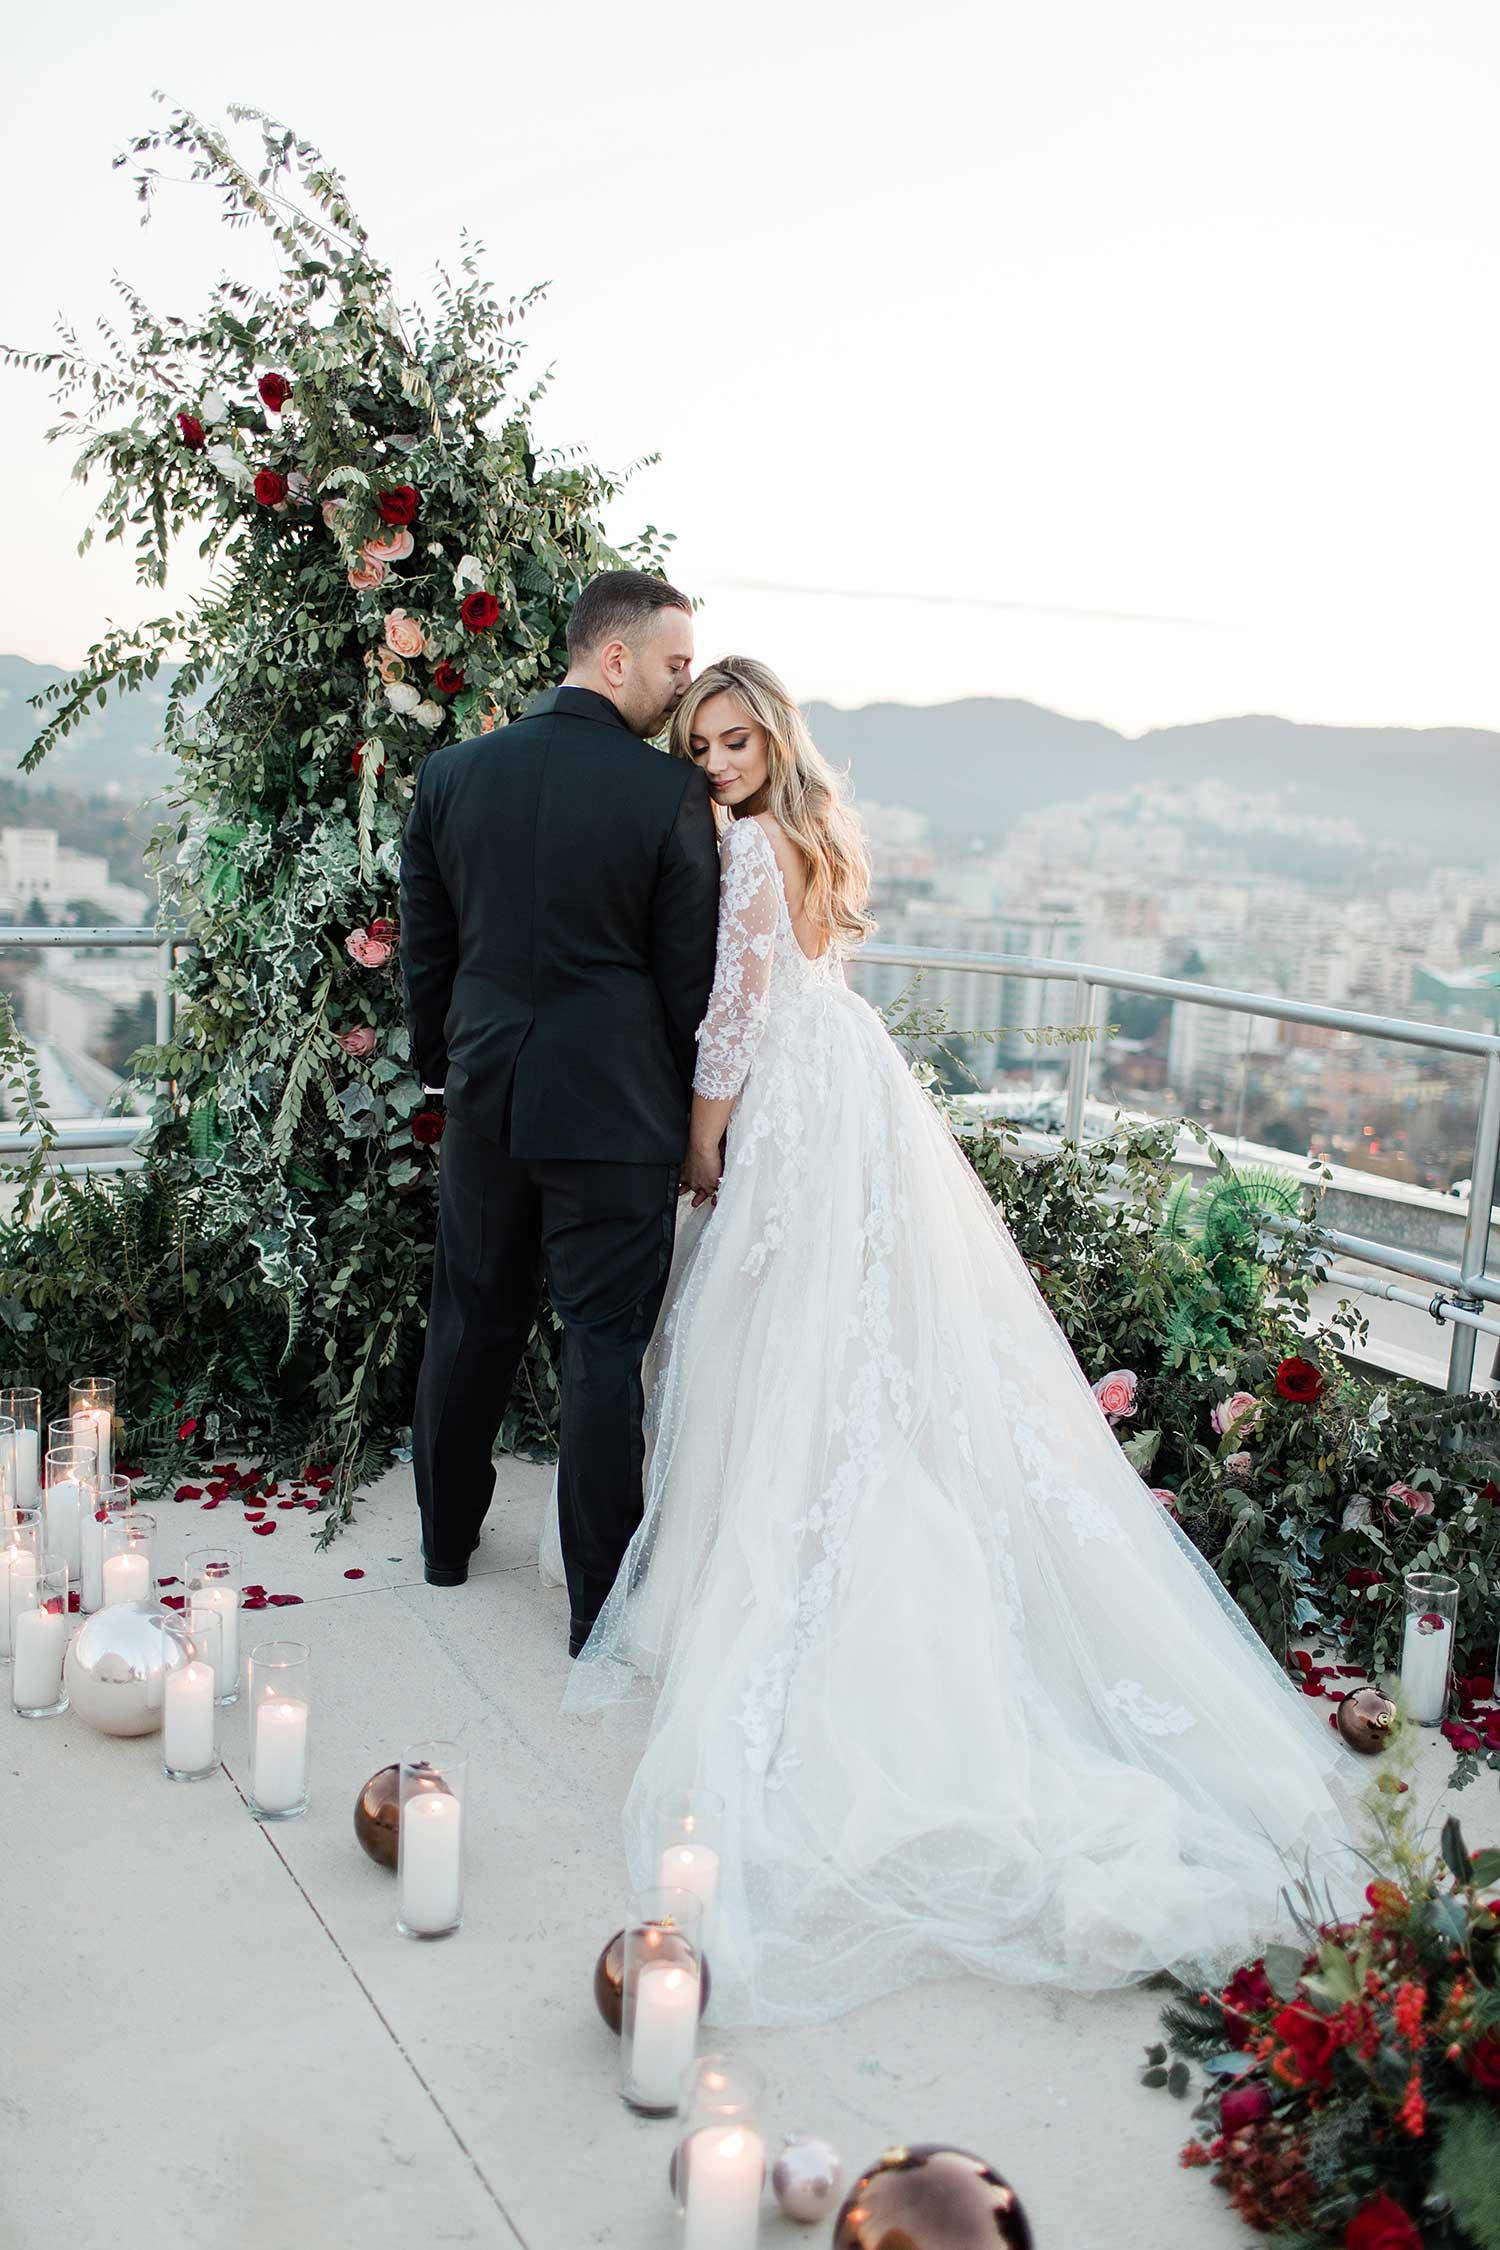 Couple's ceremony photoshoot on the terrace